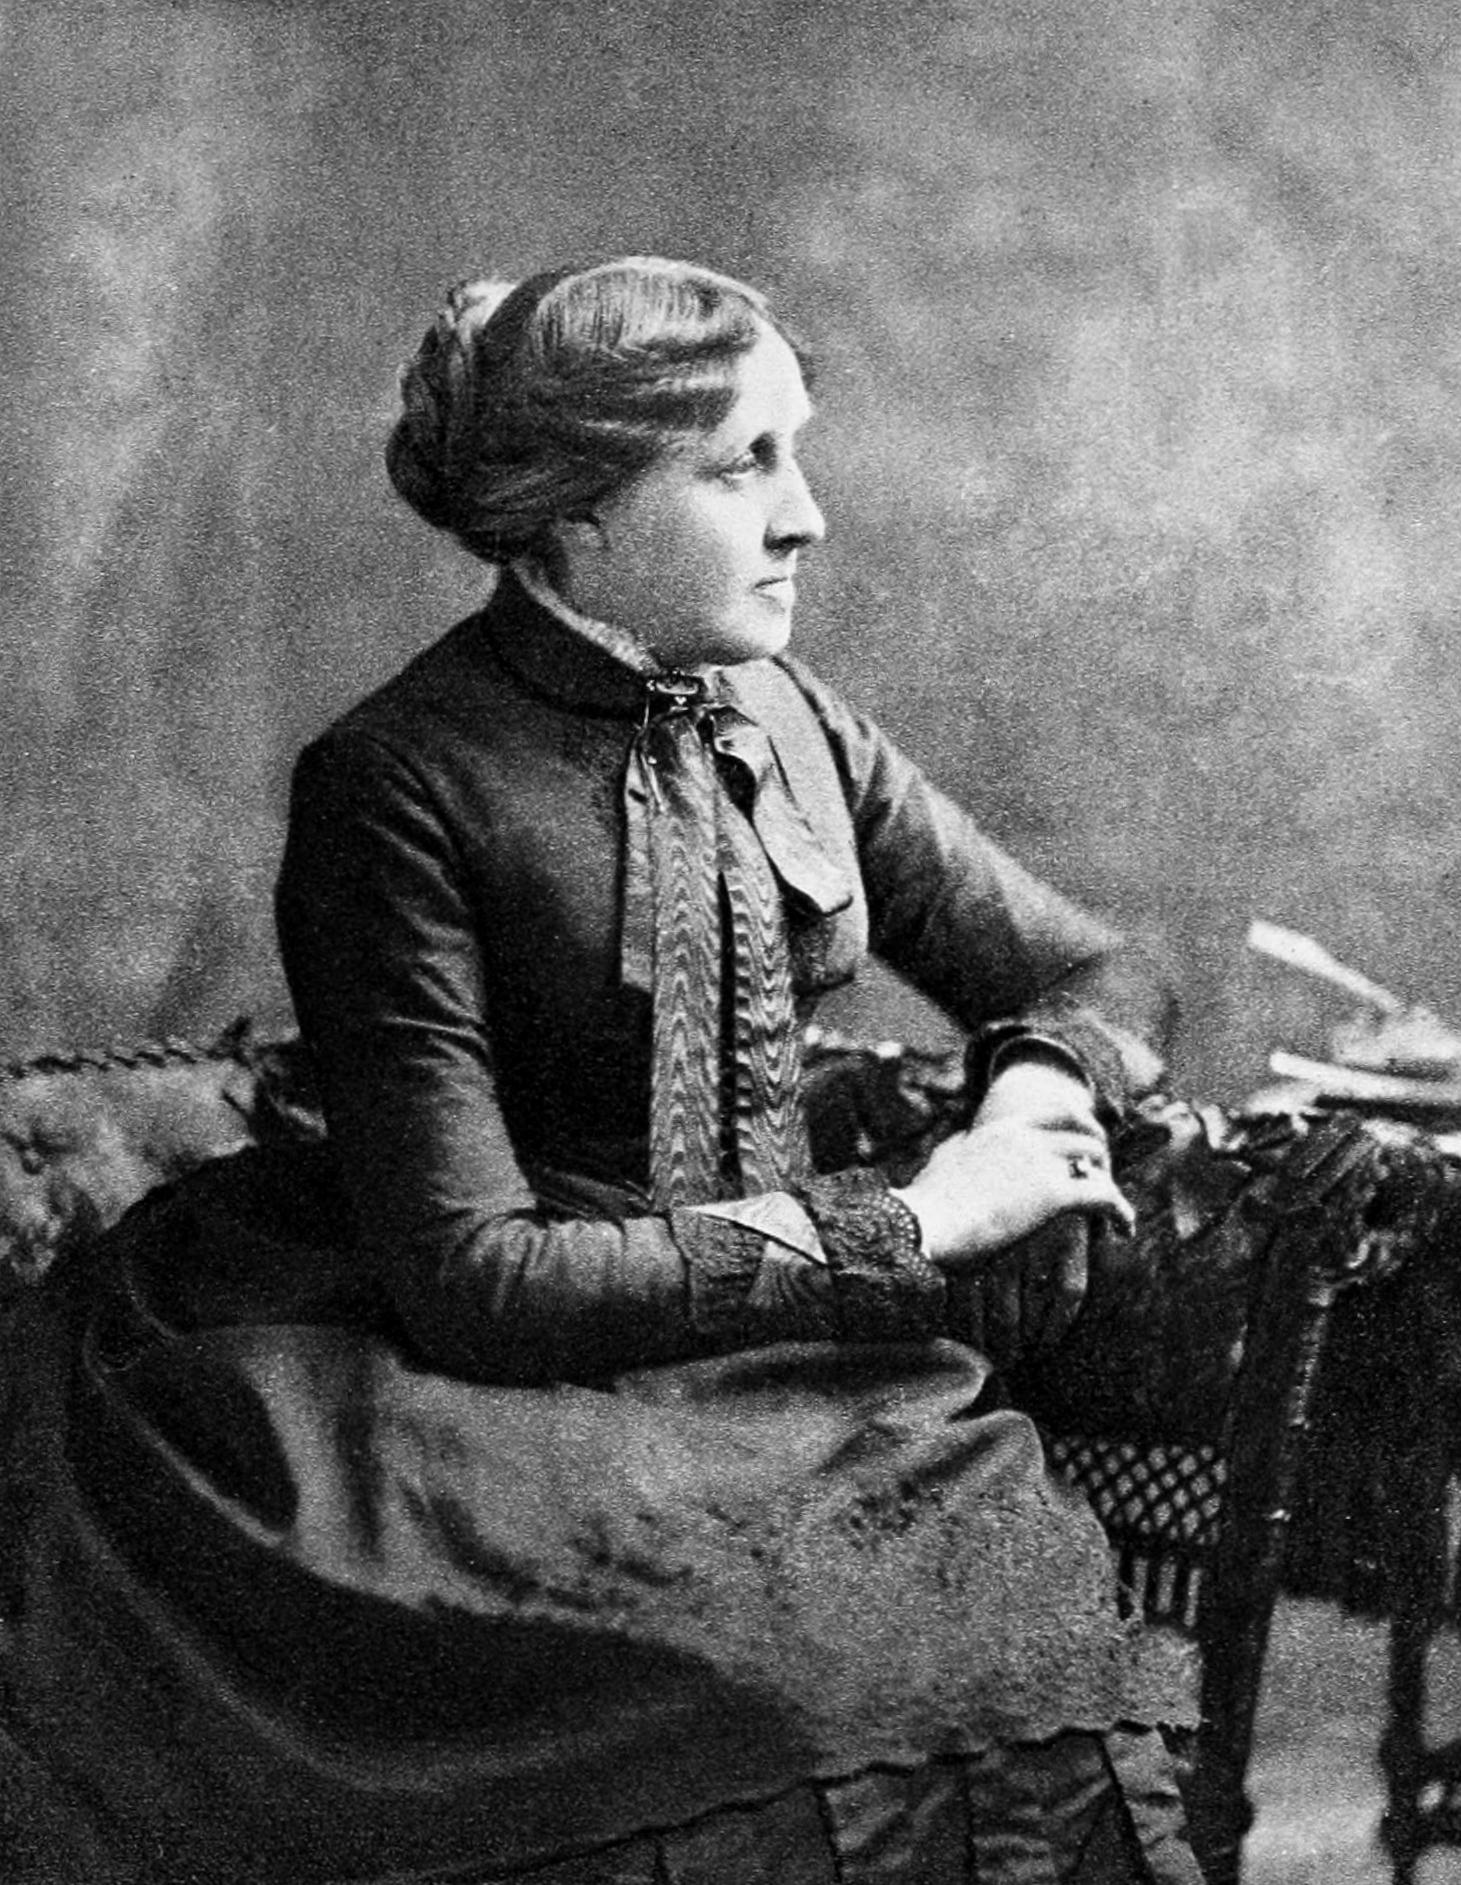 Louisa May Alcott